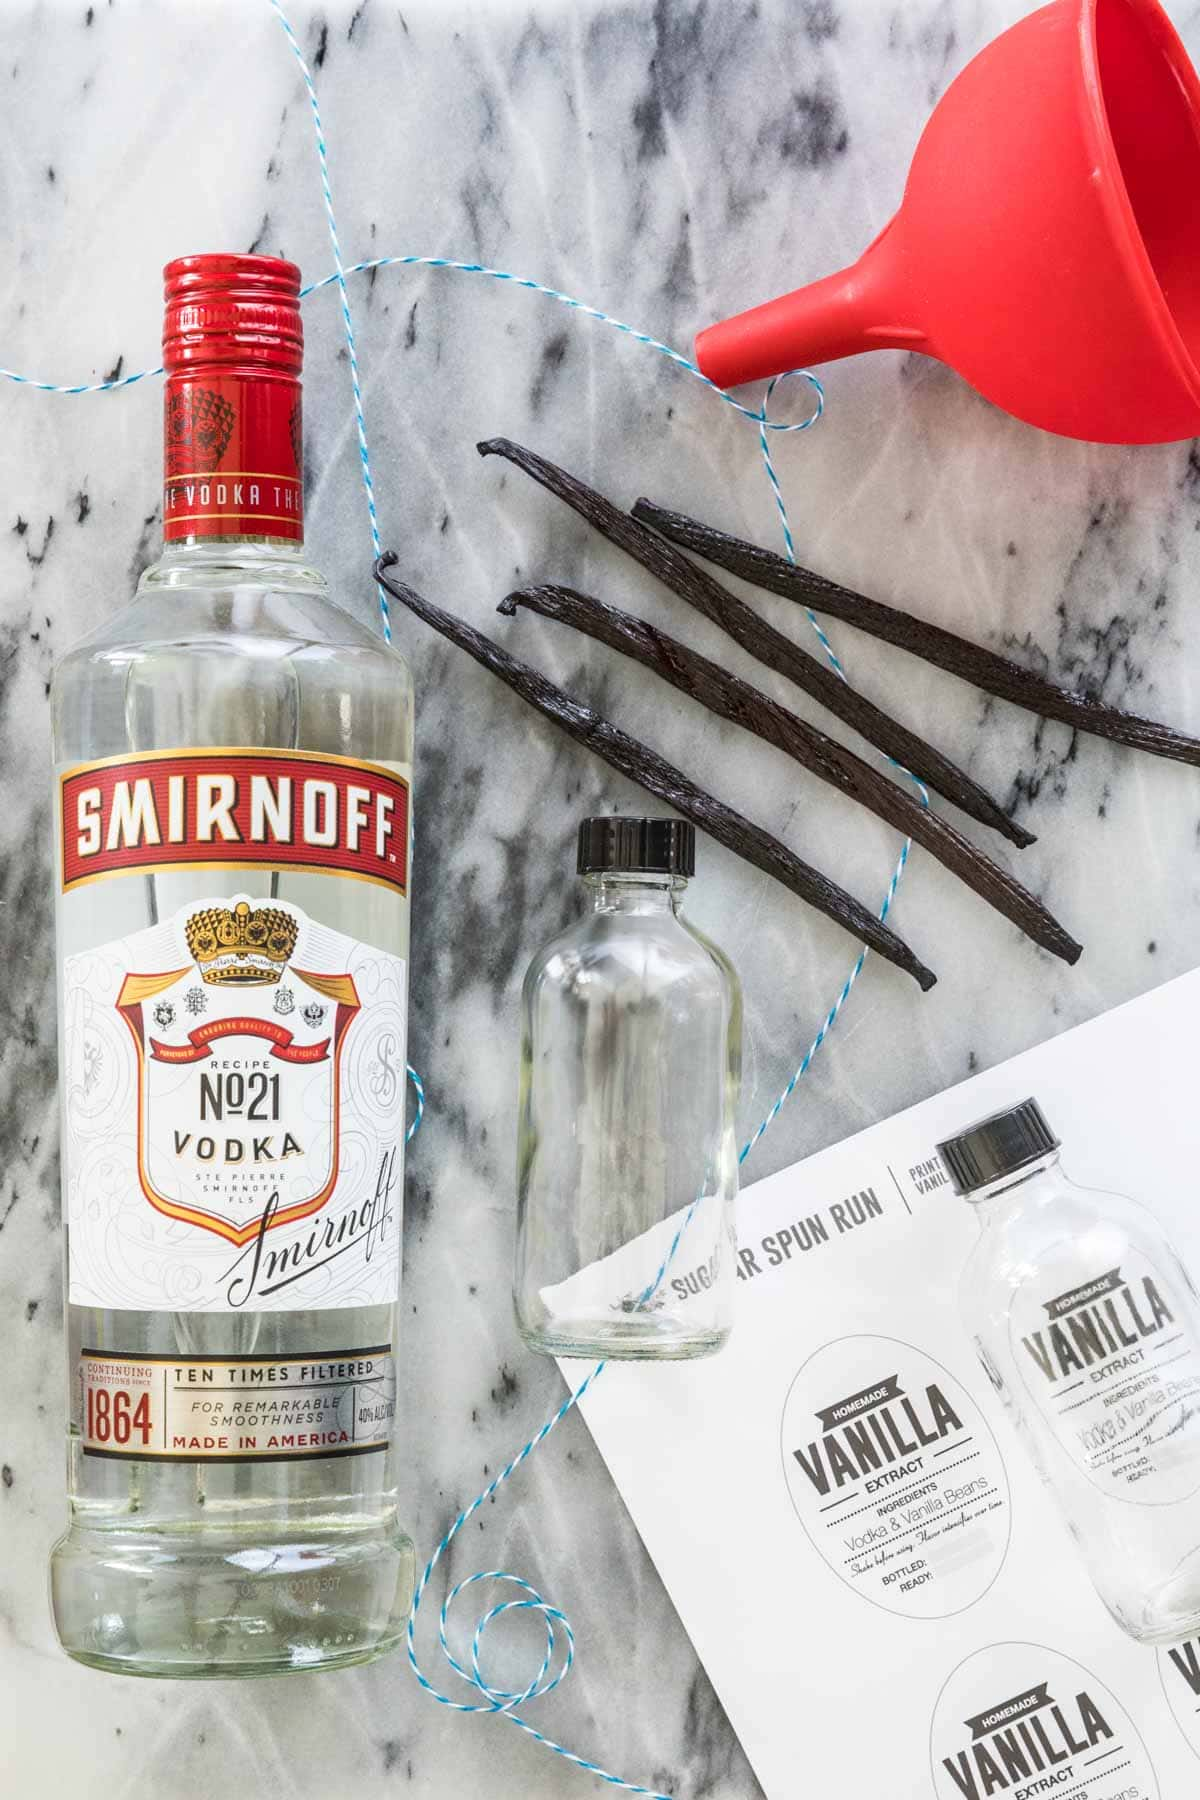 Ingredients for vanilla extract